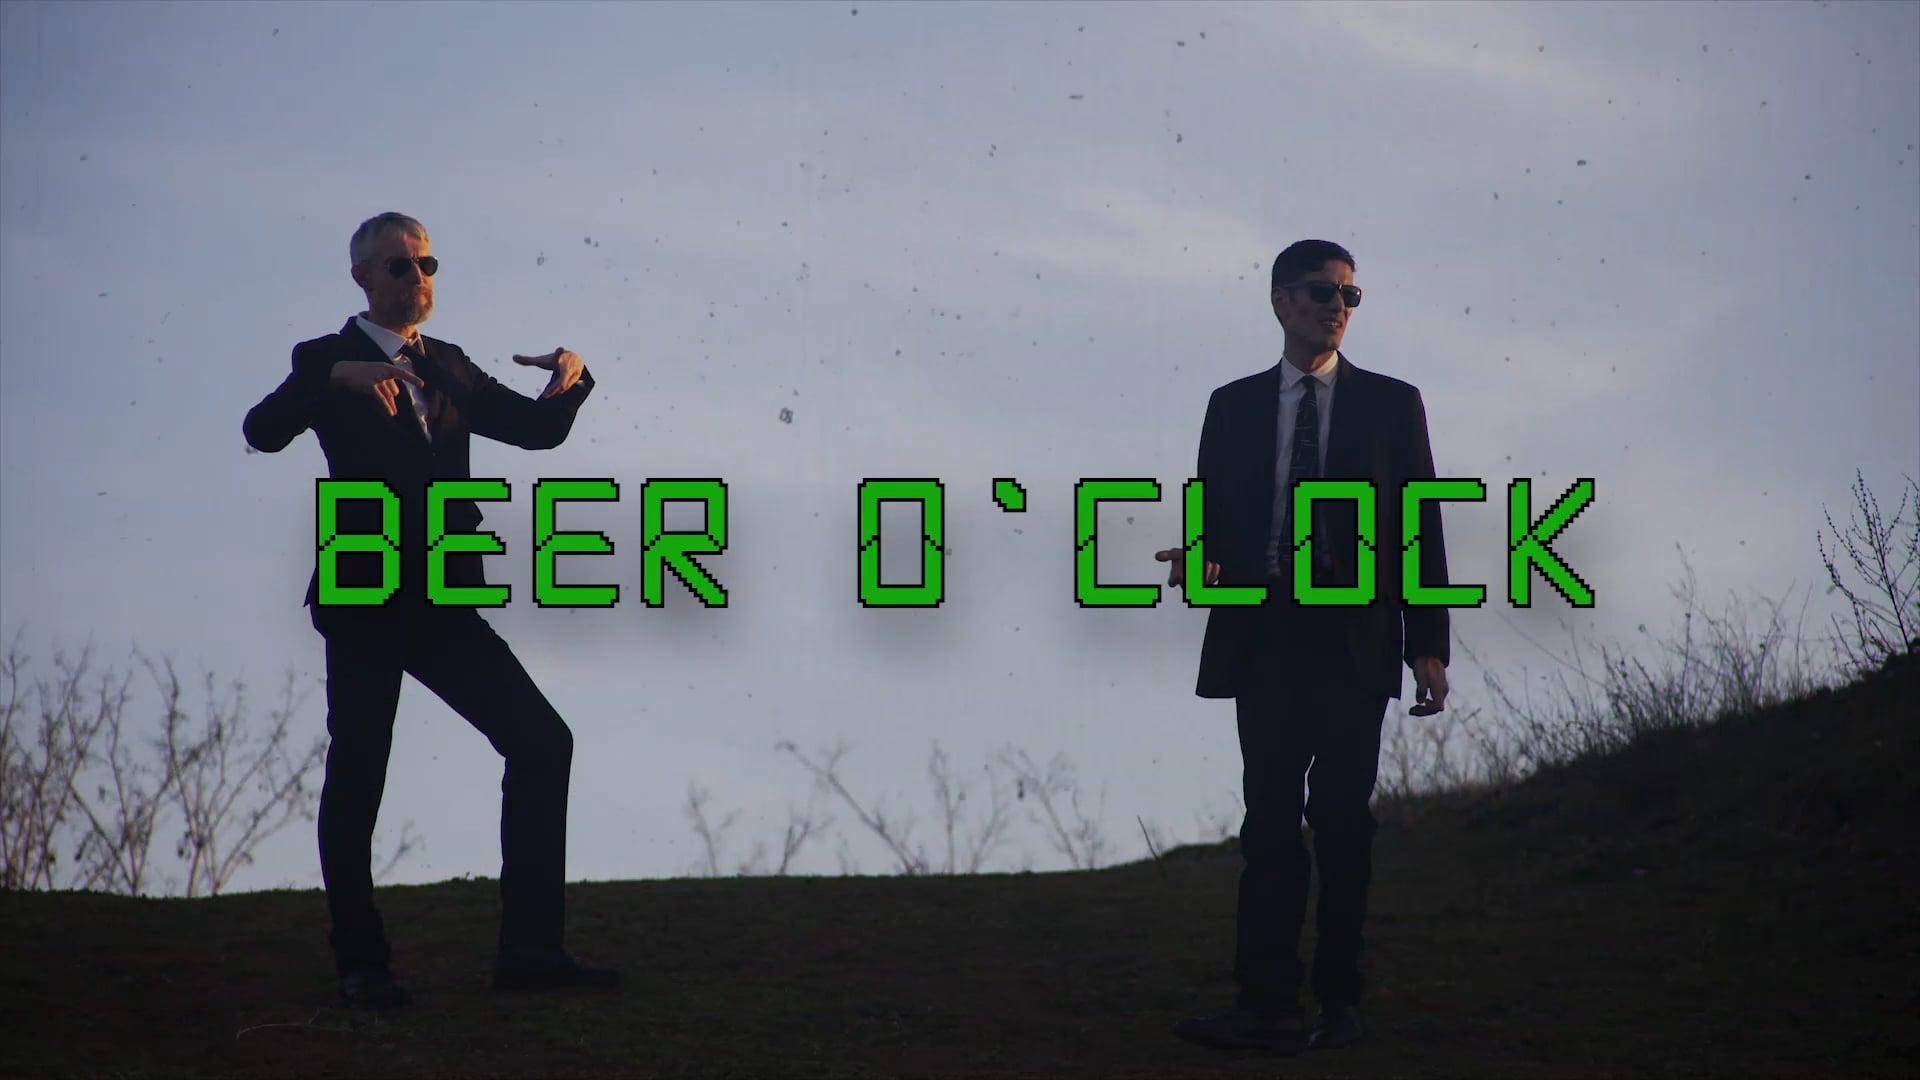 Beer O' Clock - Socialeyez